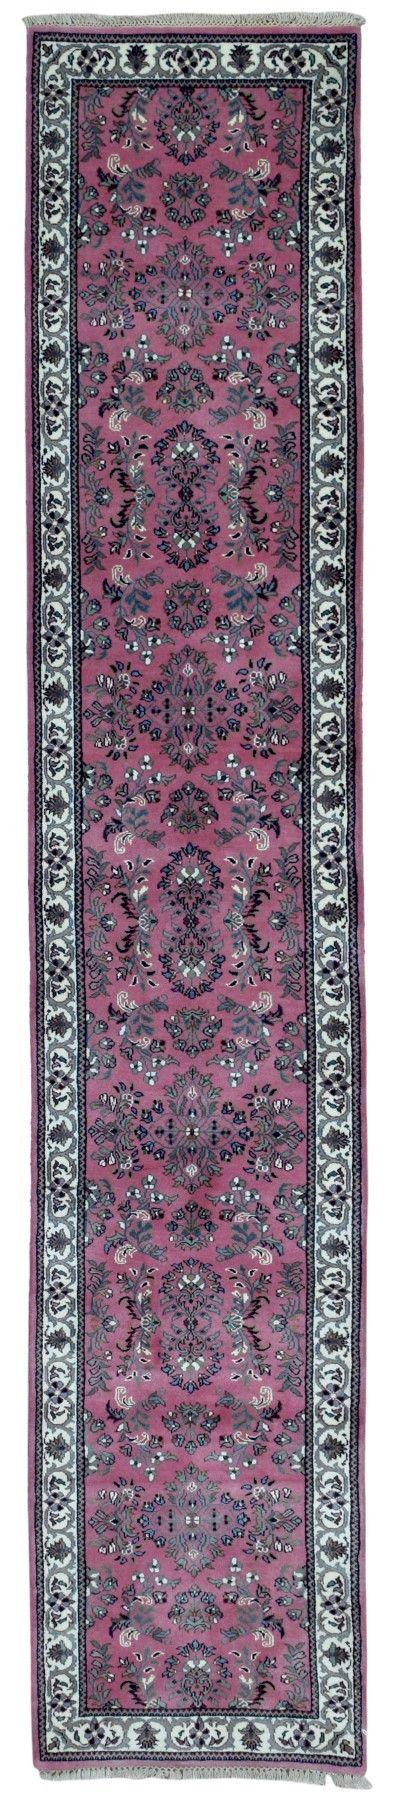 Fine Sarouk Oriental Long Runner Rug 2'X10'3